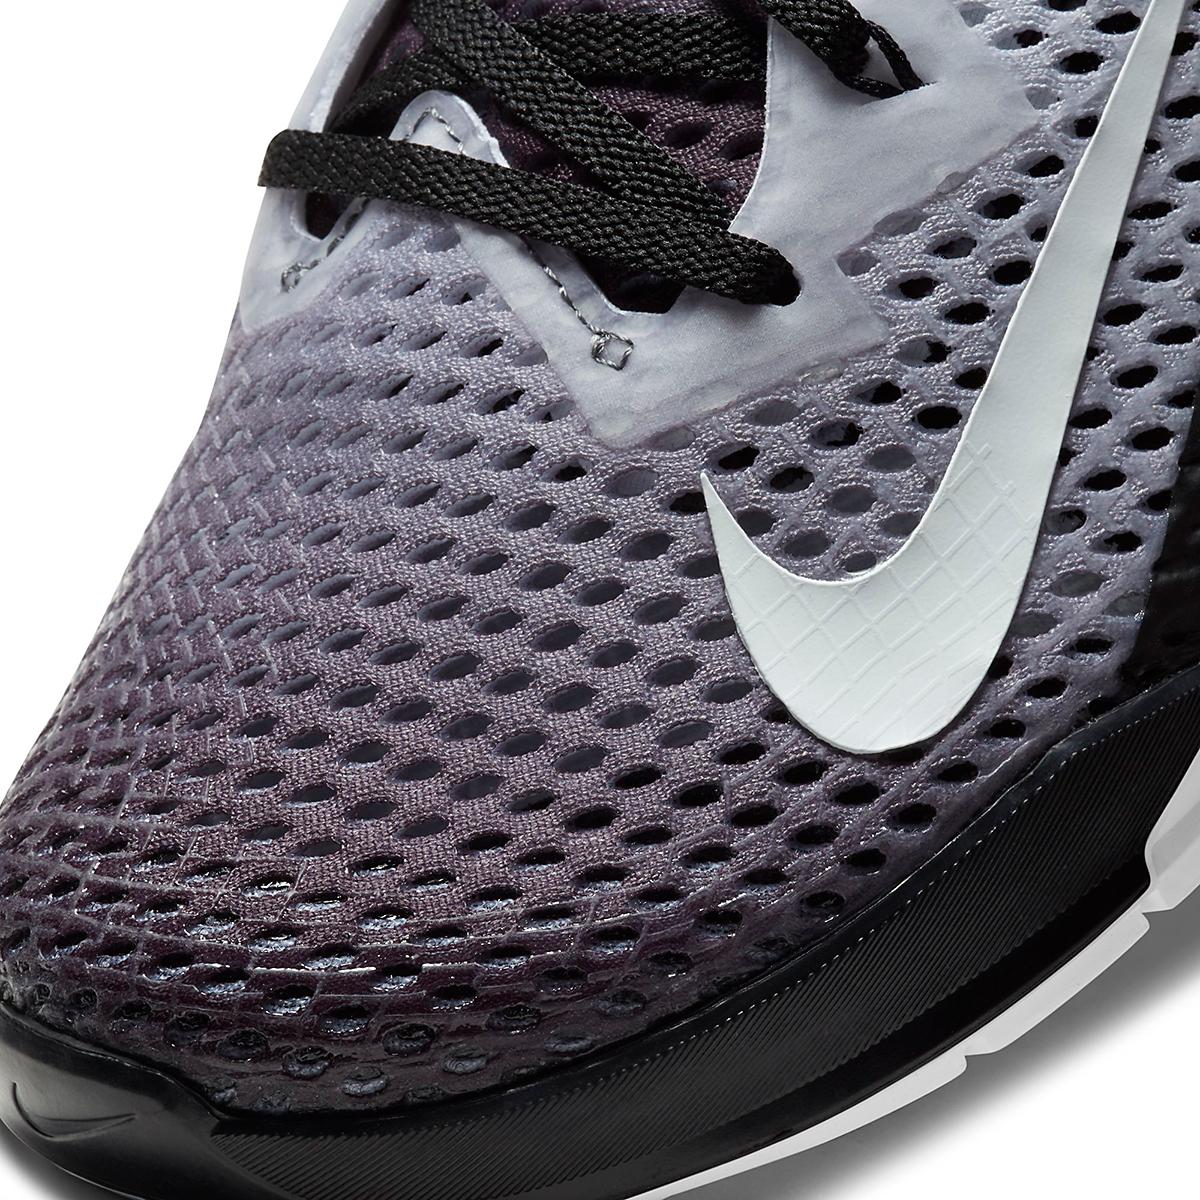 Men's Nike Metcon 6 Training Shoe - Color: Black/White - Size: 4 - Width: Regular, Black/White, large, image 7